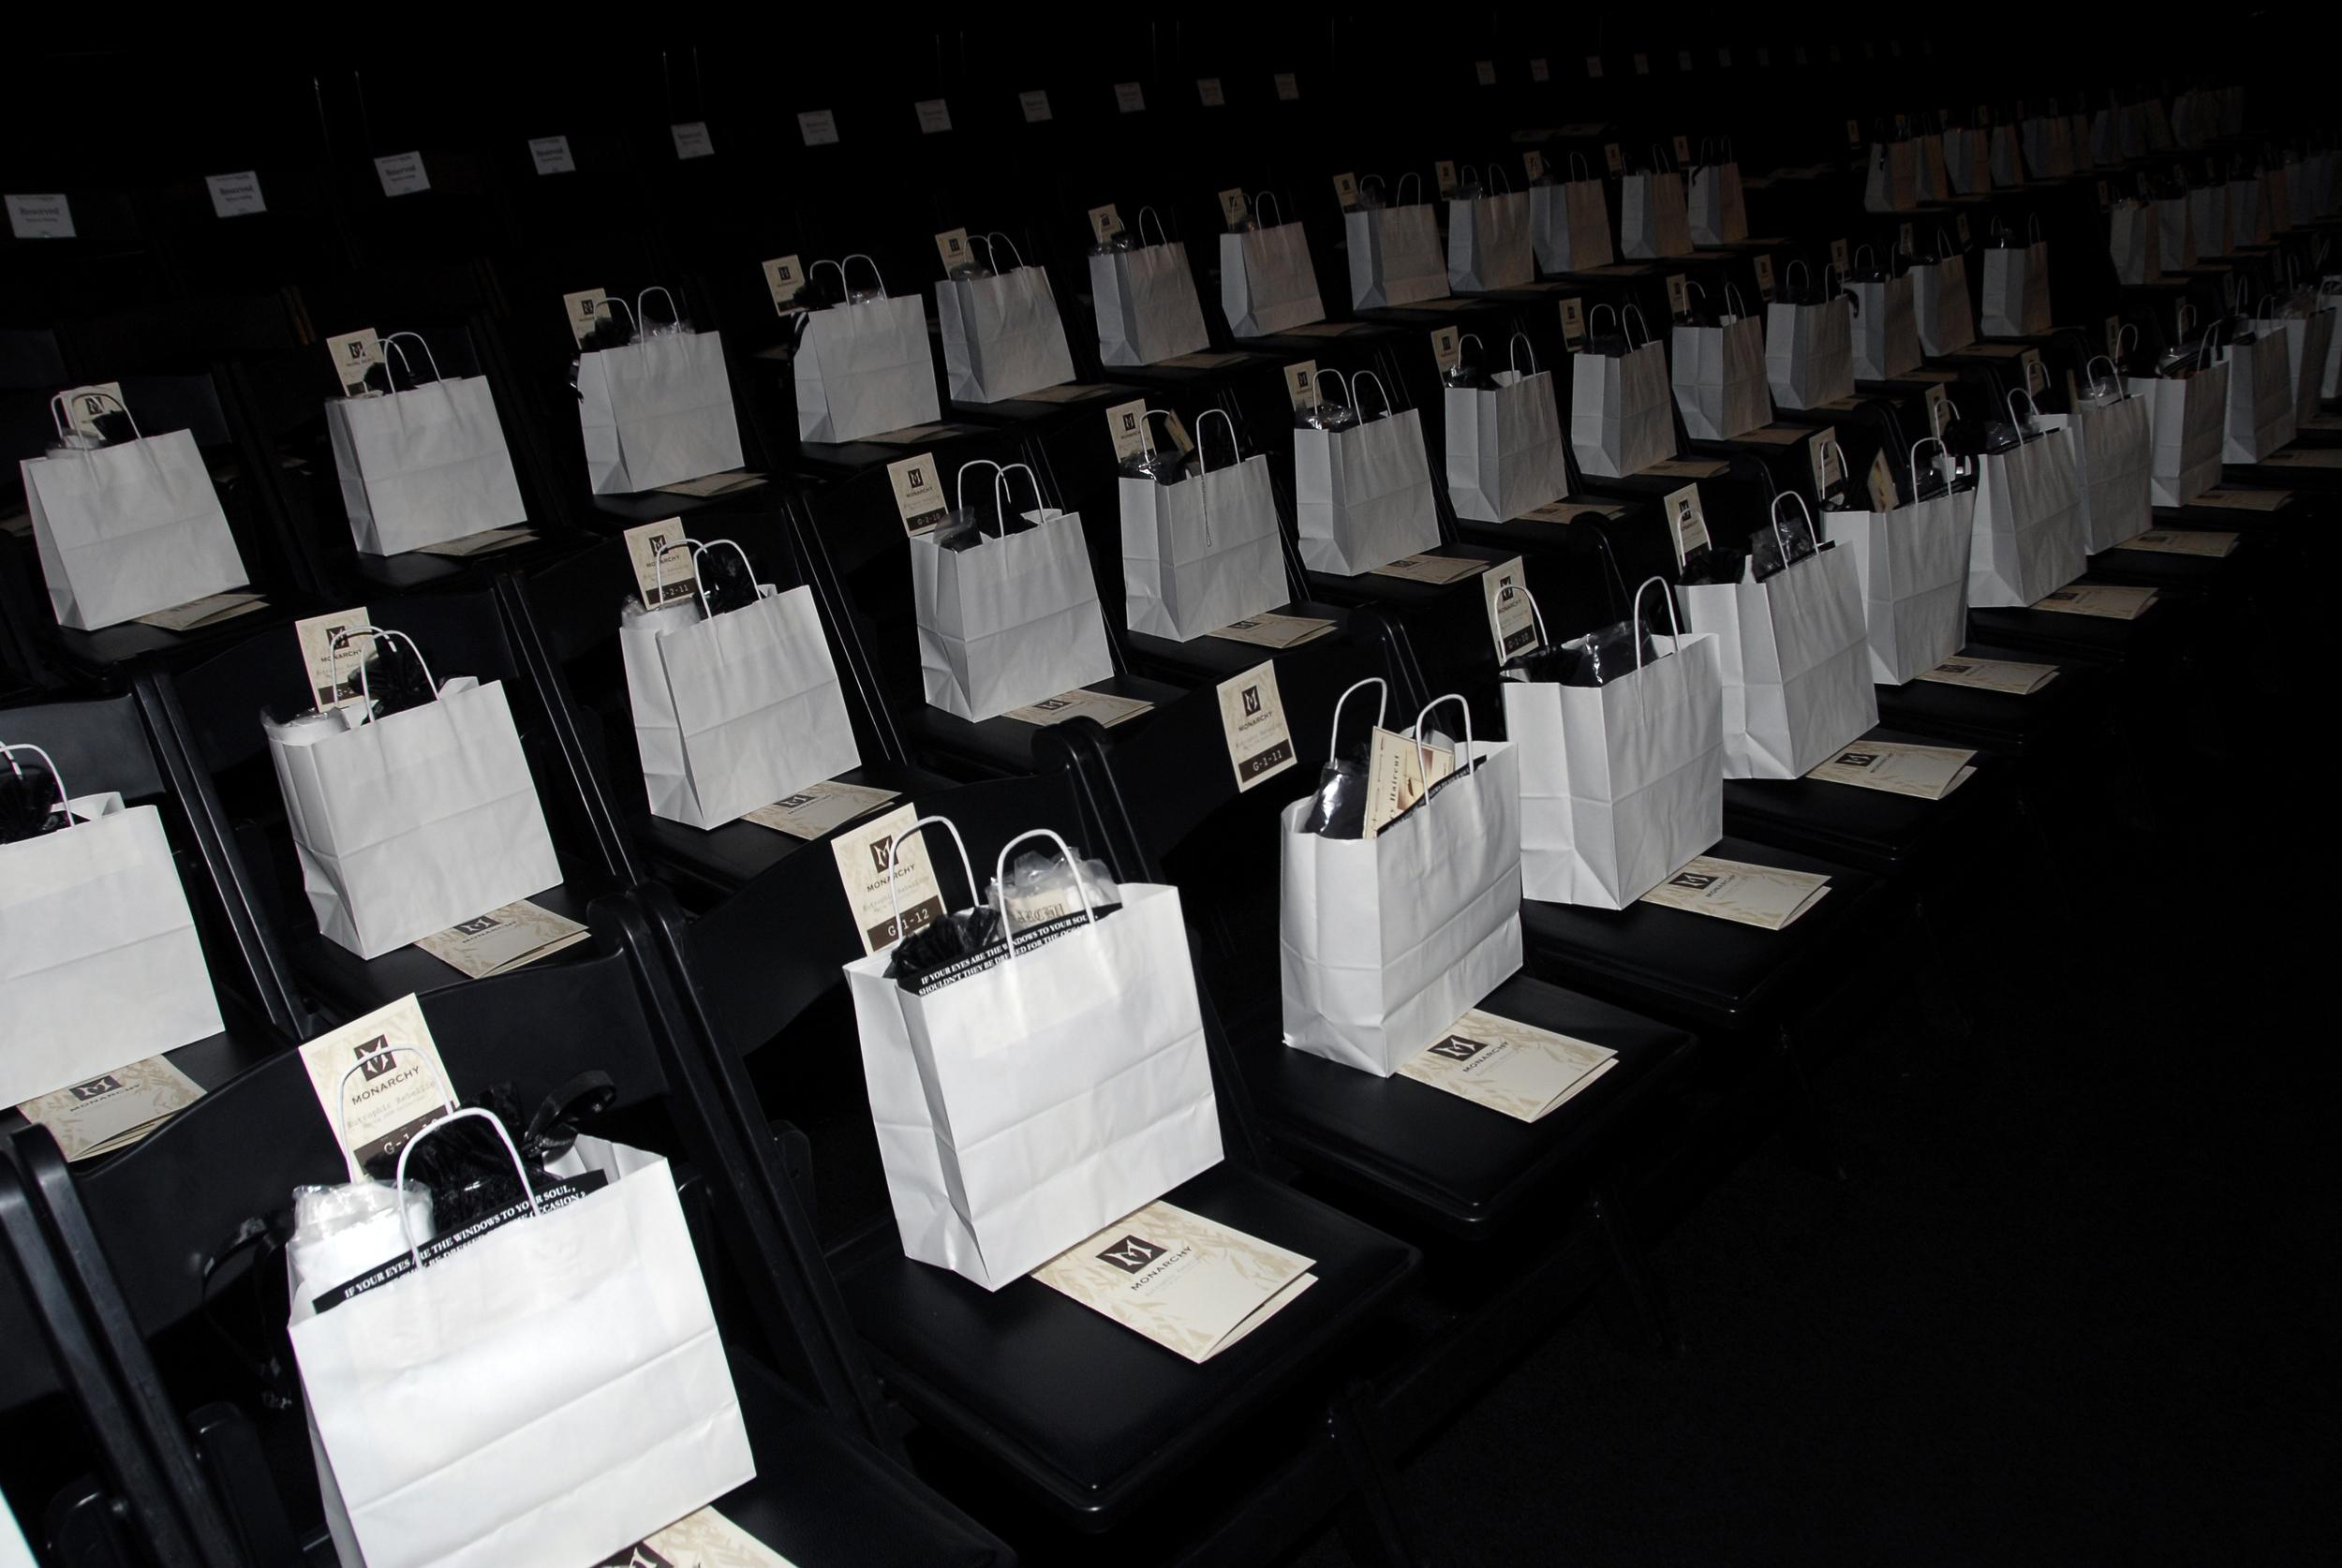 gift bags on seats.jpg